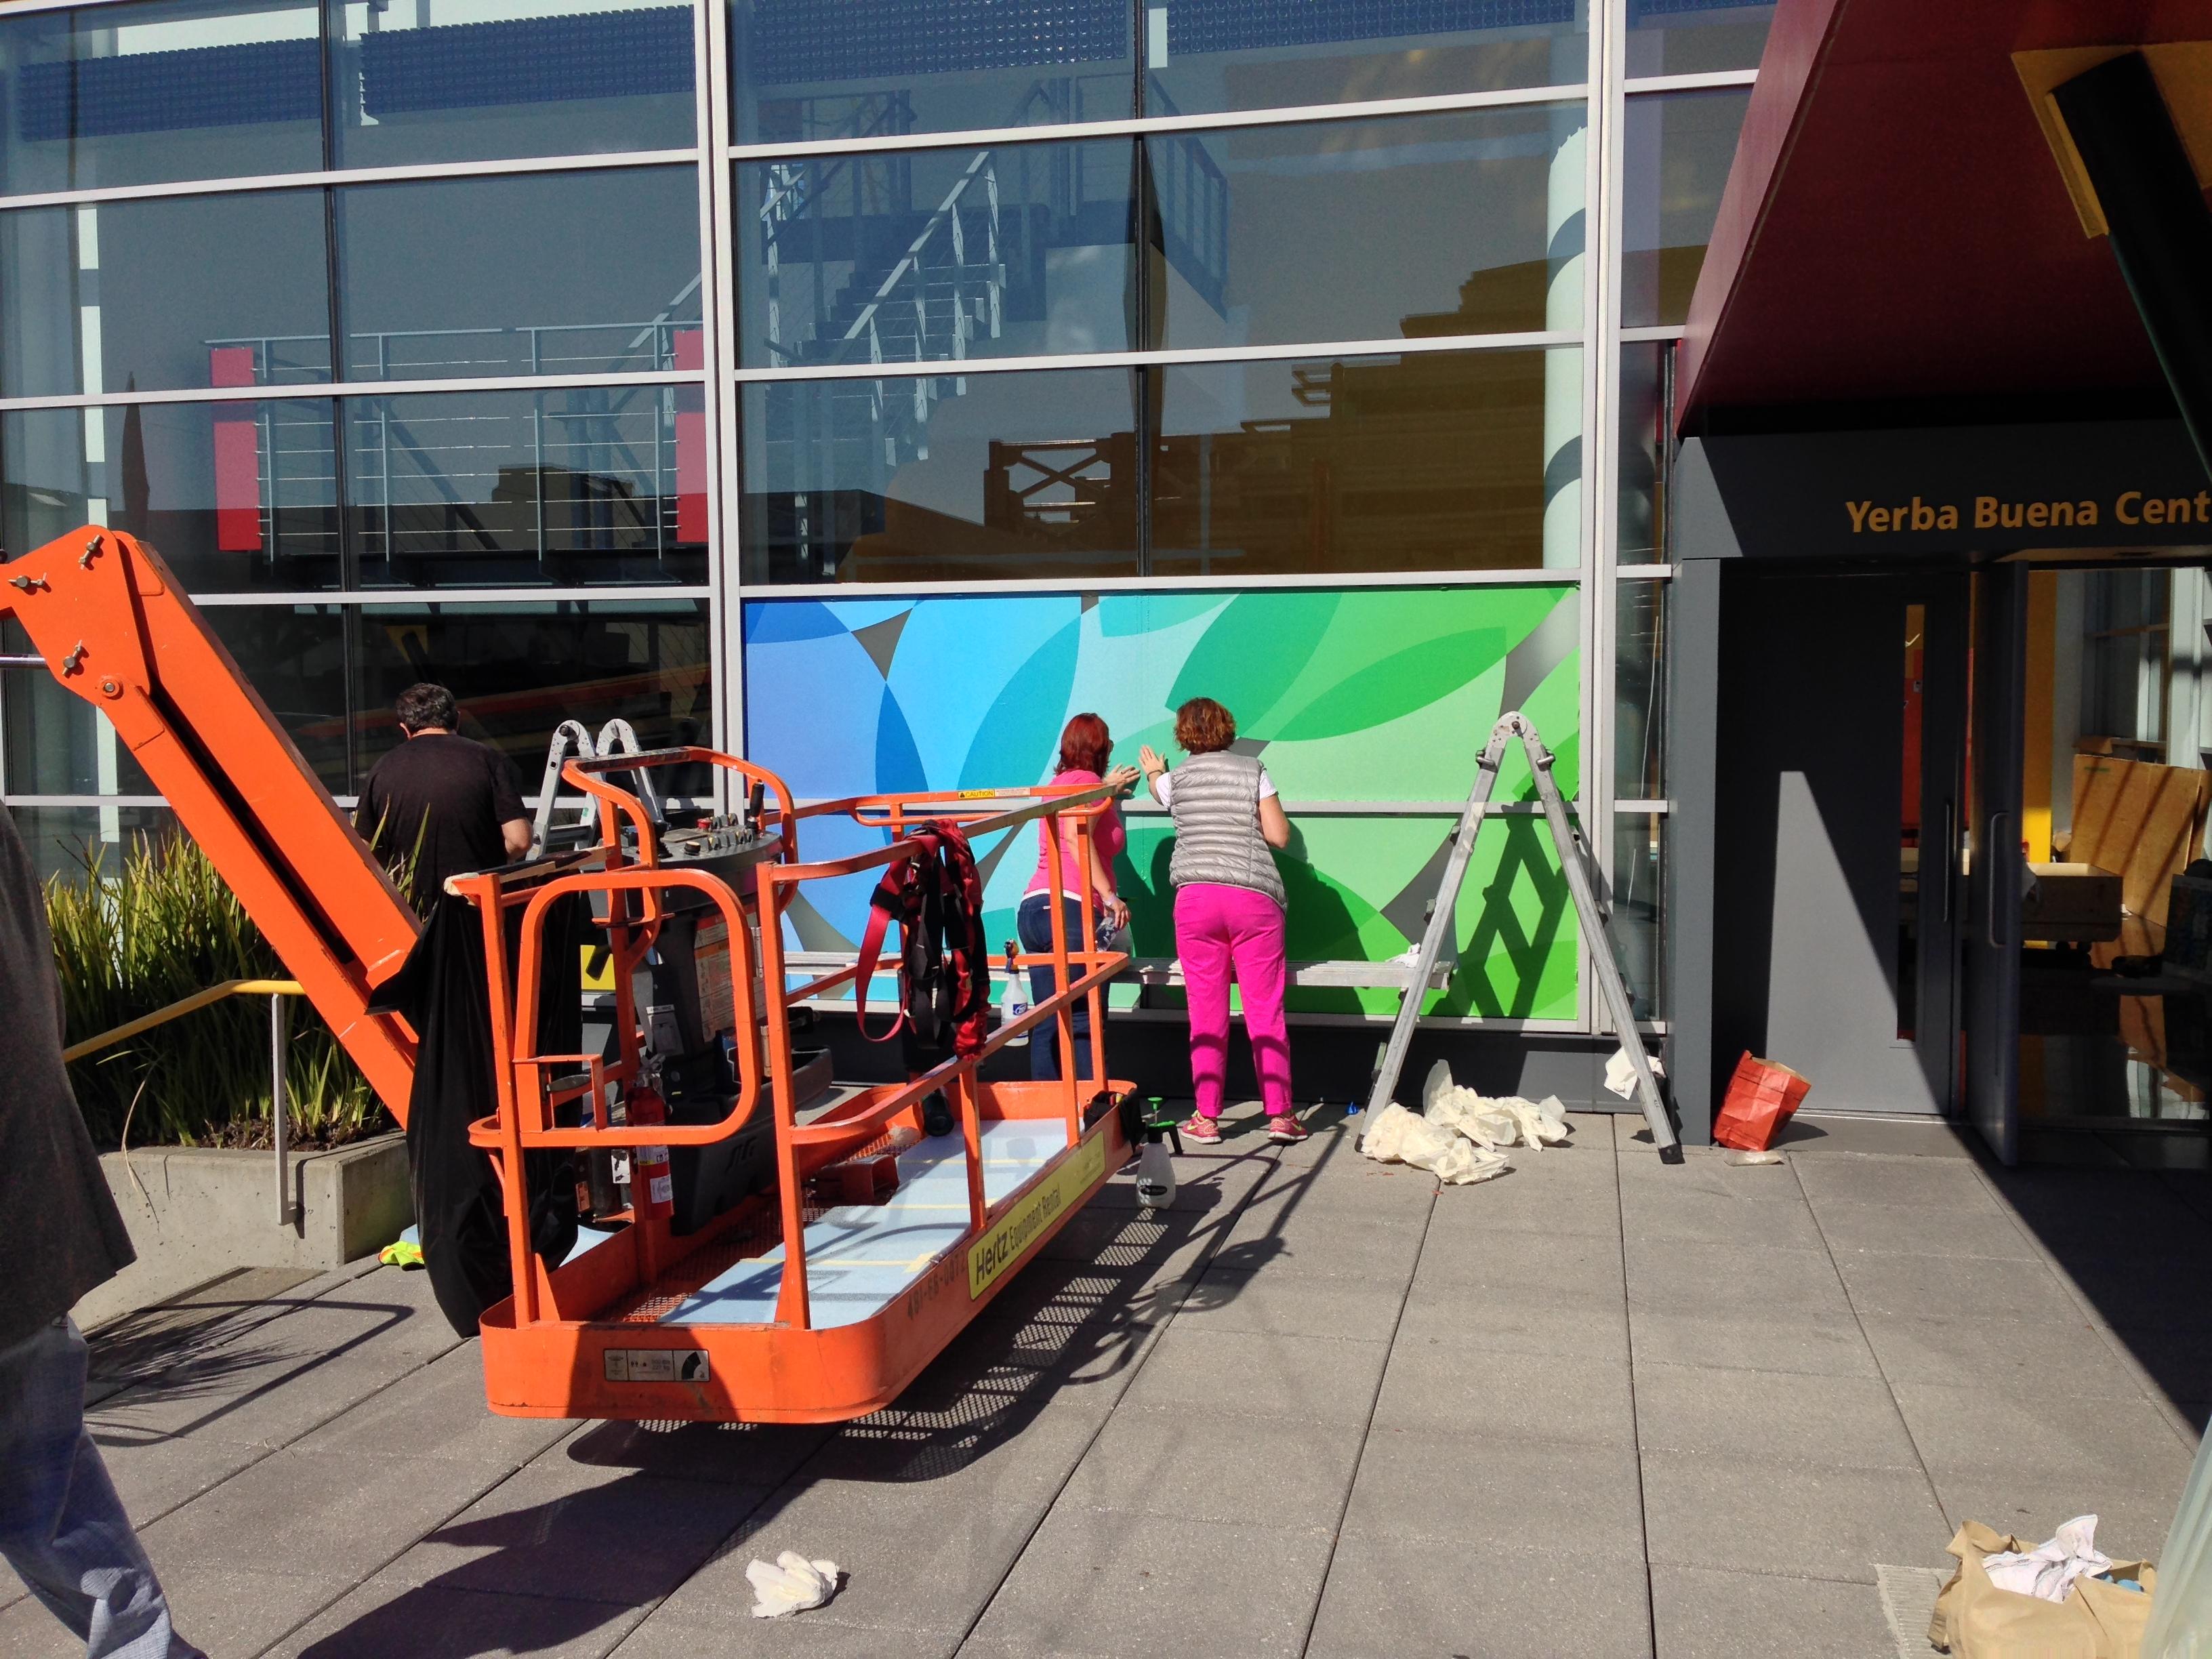 Yerba Buena Center - San Francisco - Dekoration - iPad Event - Apple Event - We still habe a lot to cover - Hack4Life